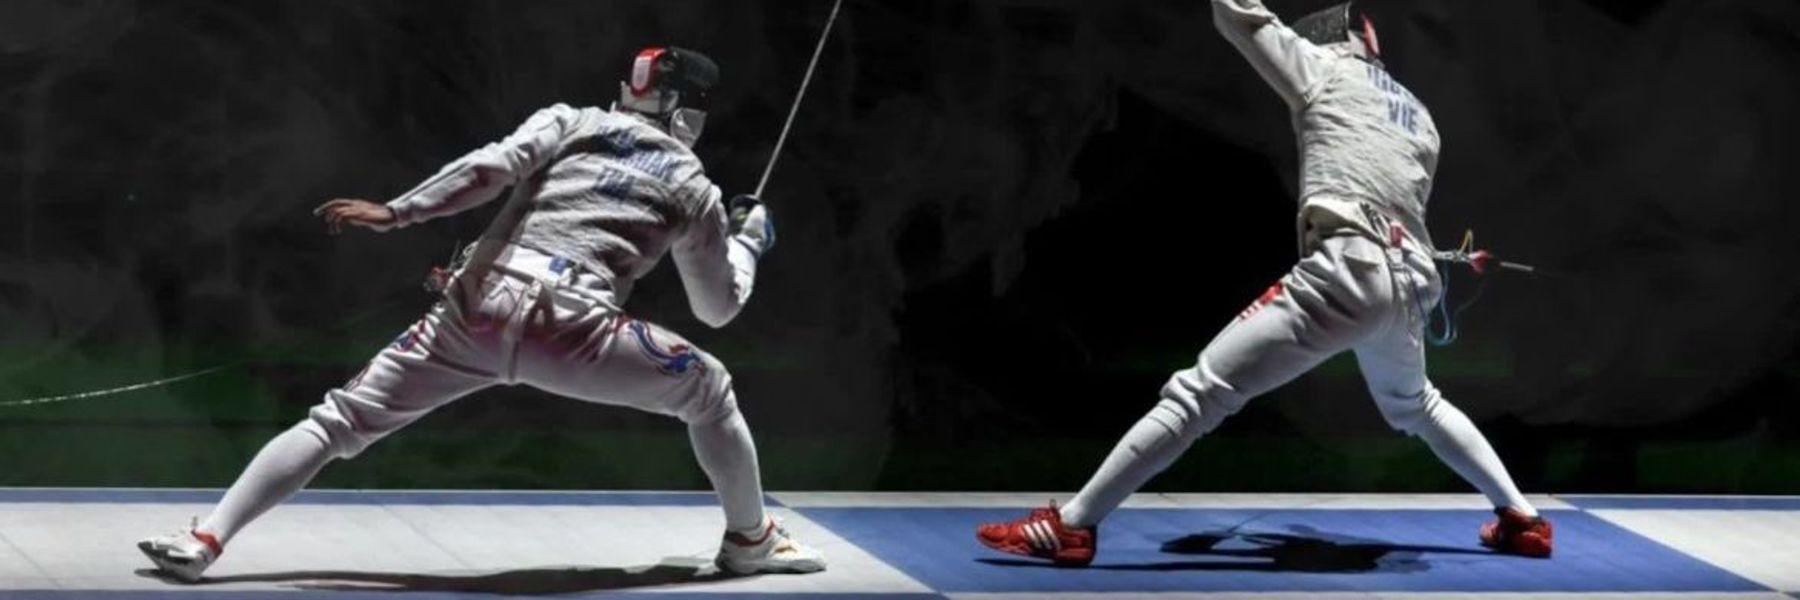 Mastery Fencing Club image